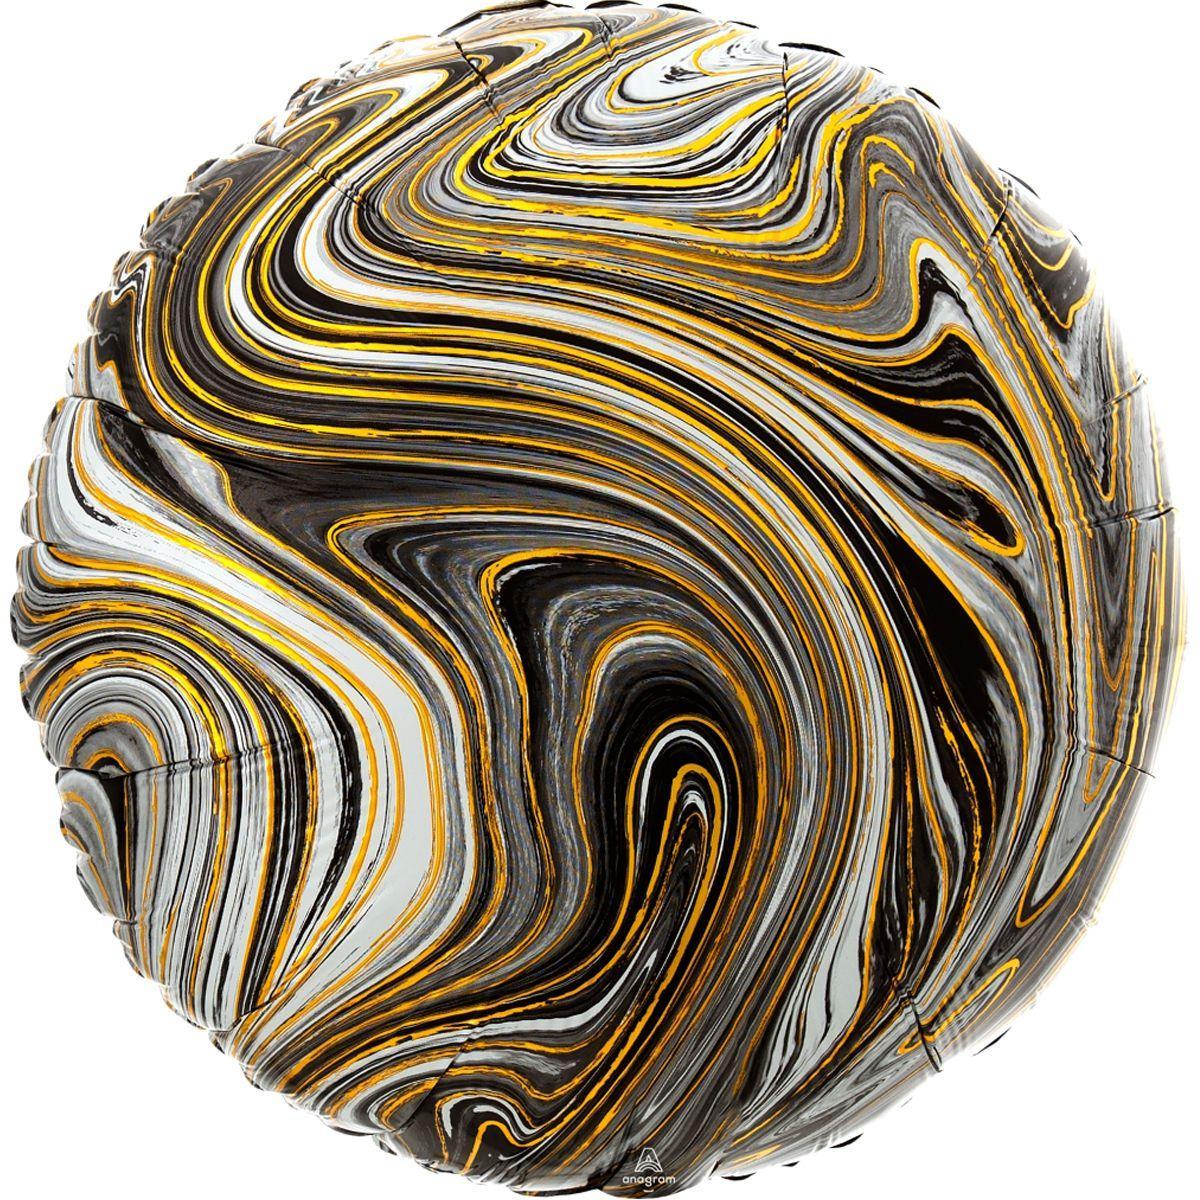 "Фольгированный Шар Круг с Рисунком Anagram (США) Агат Black Marble 18""/43 см"